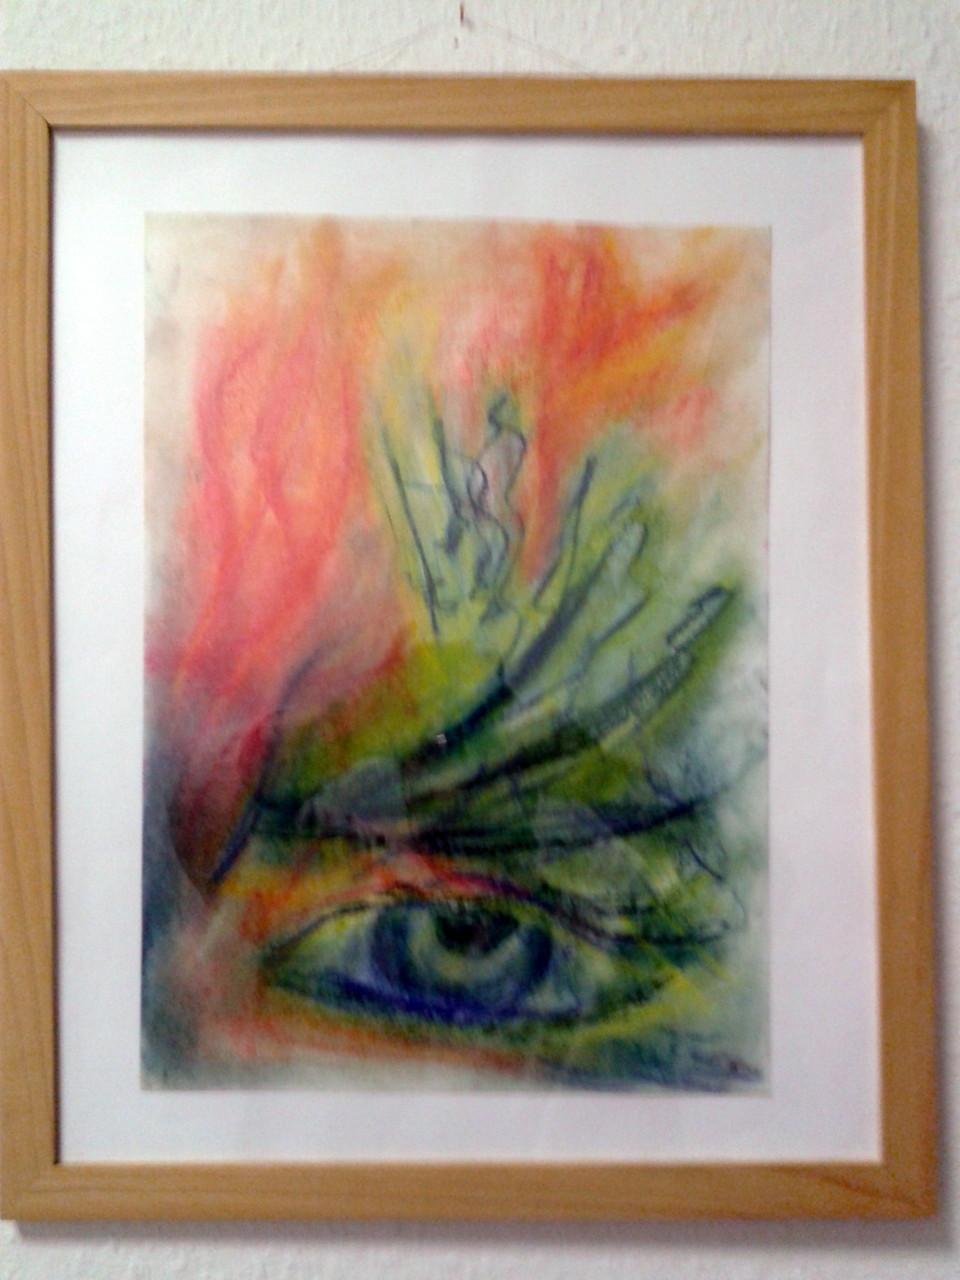 das Auge, Pastellkreide a Papier,